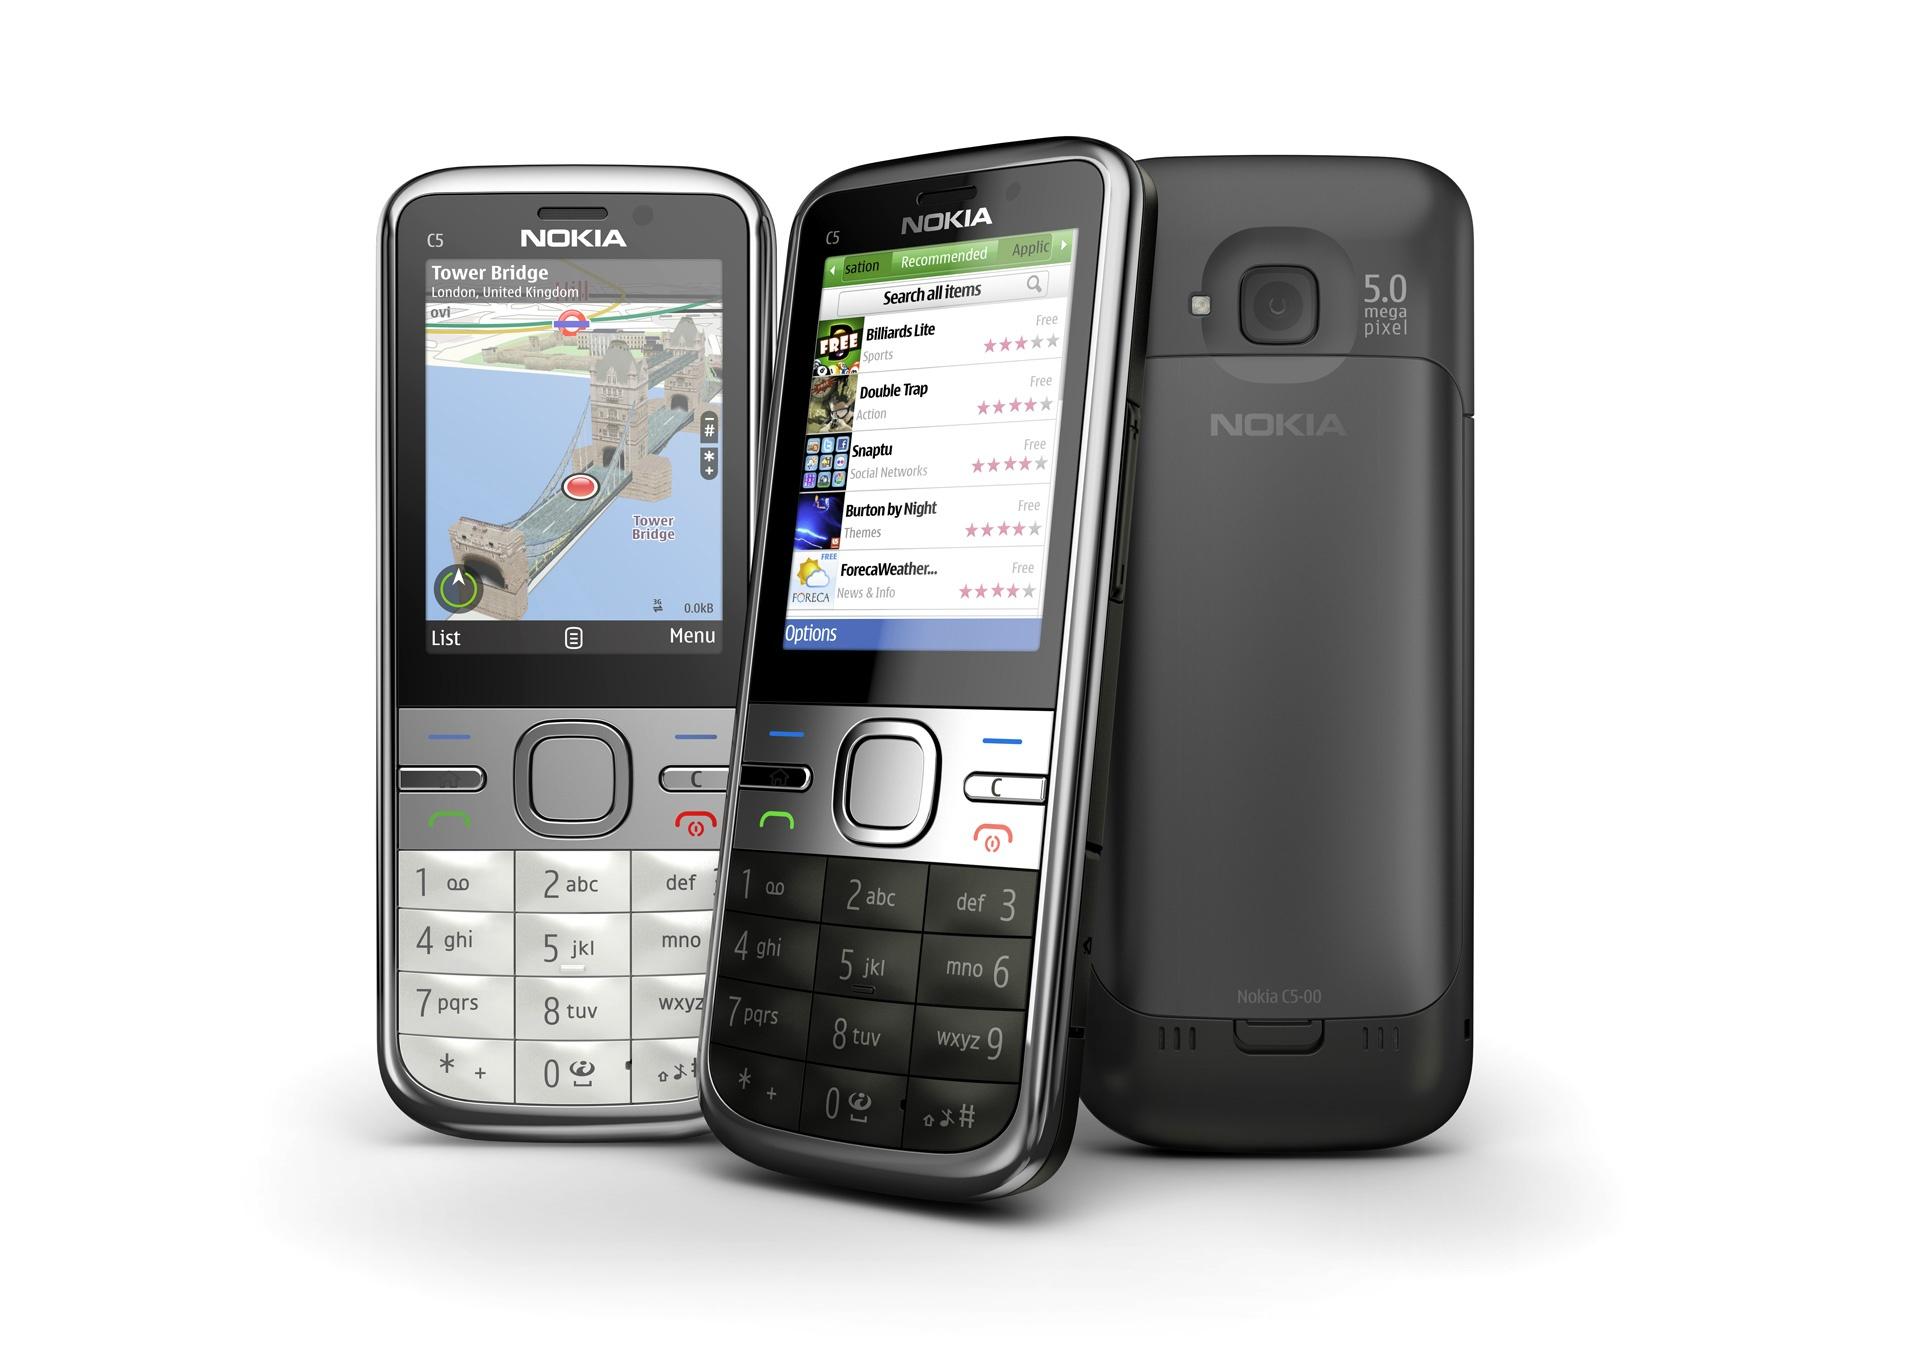 Nokia C7 Astound Specs